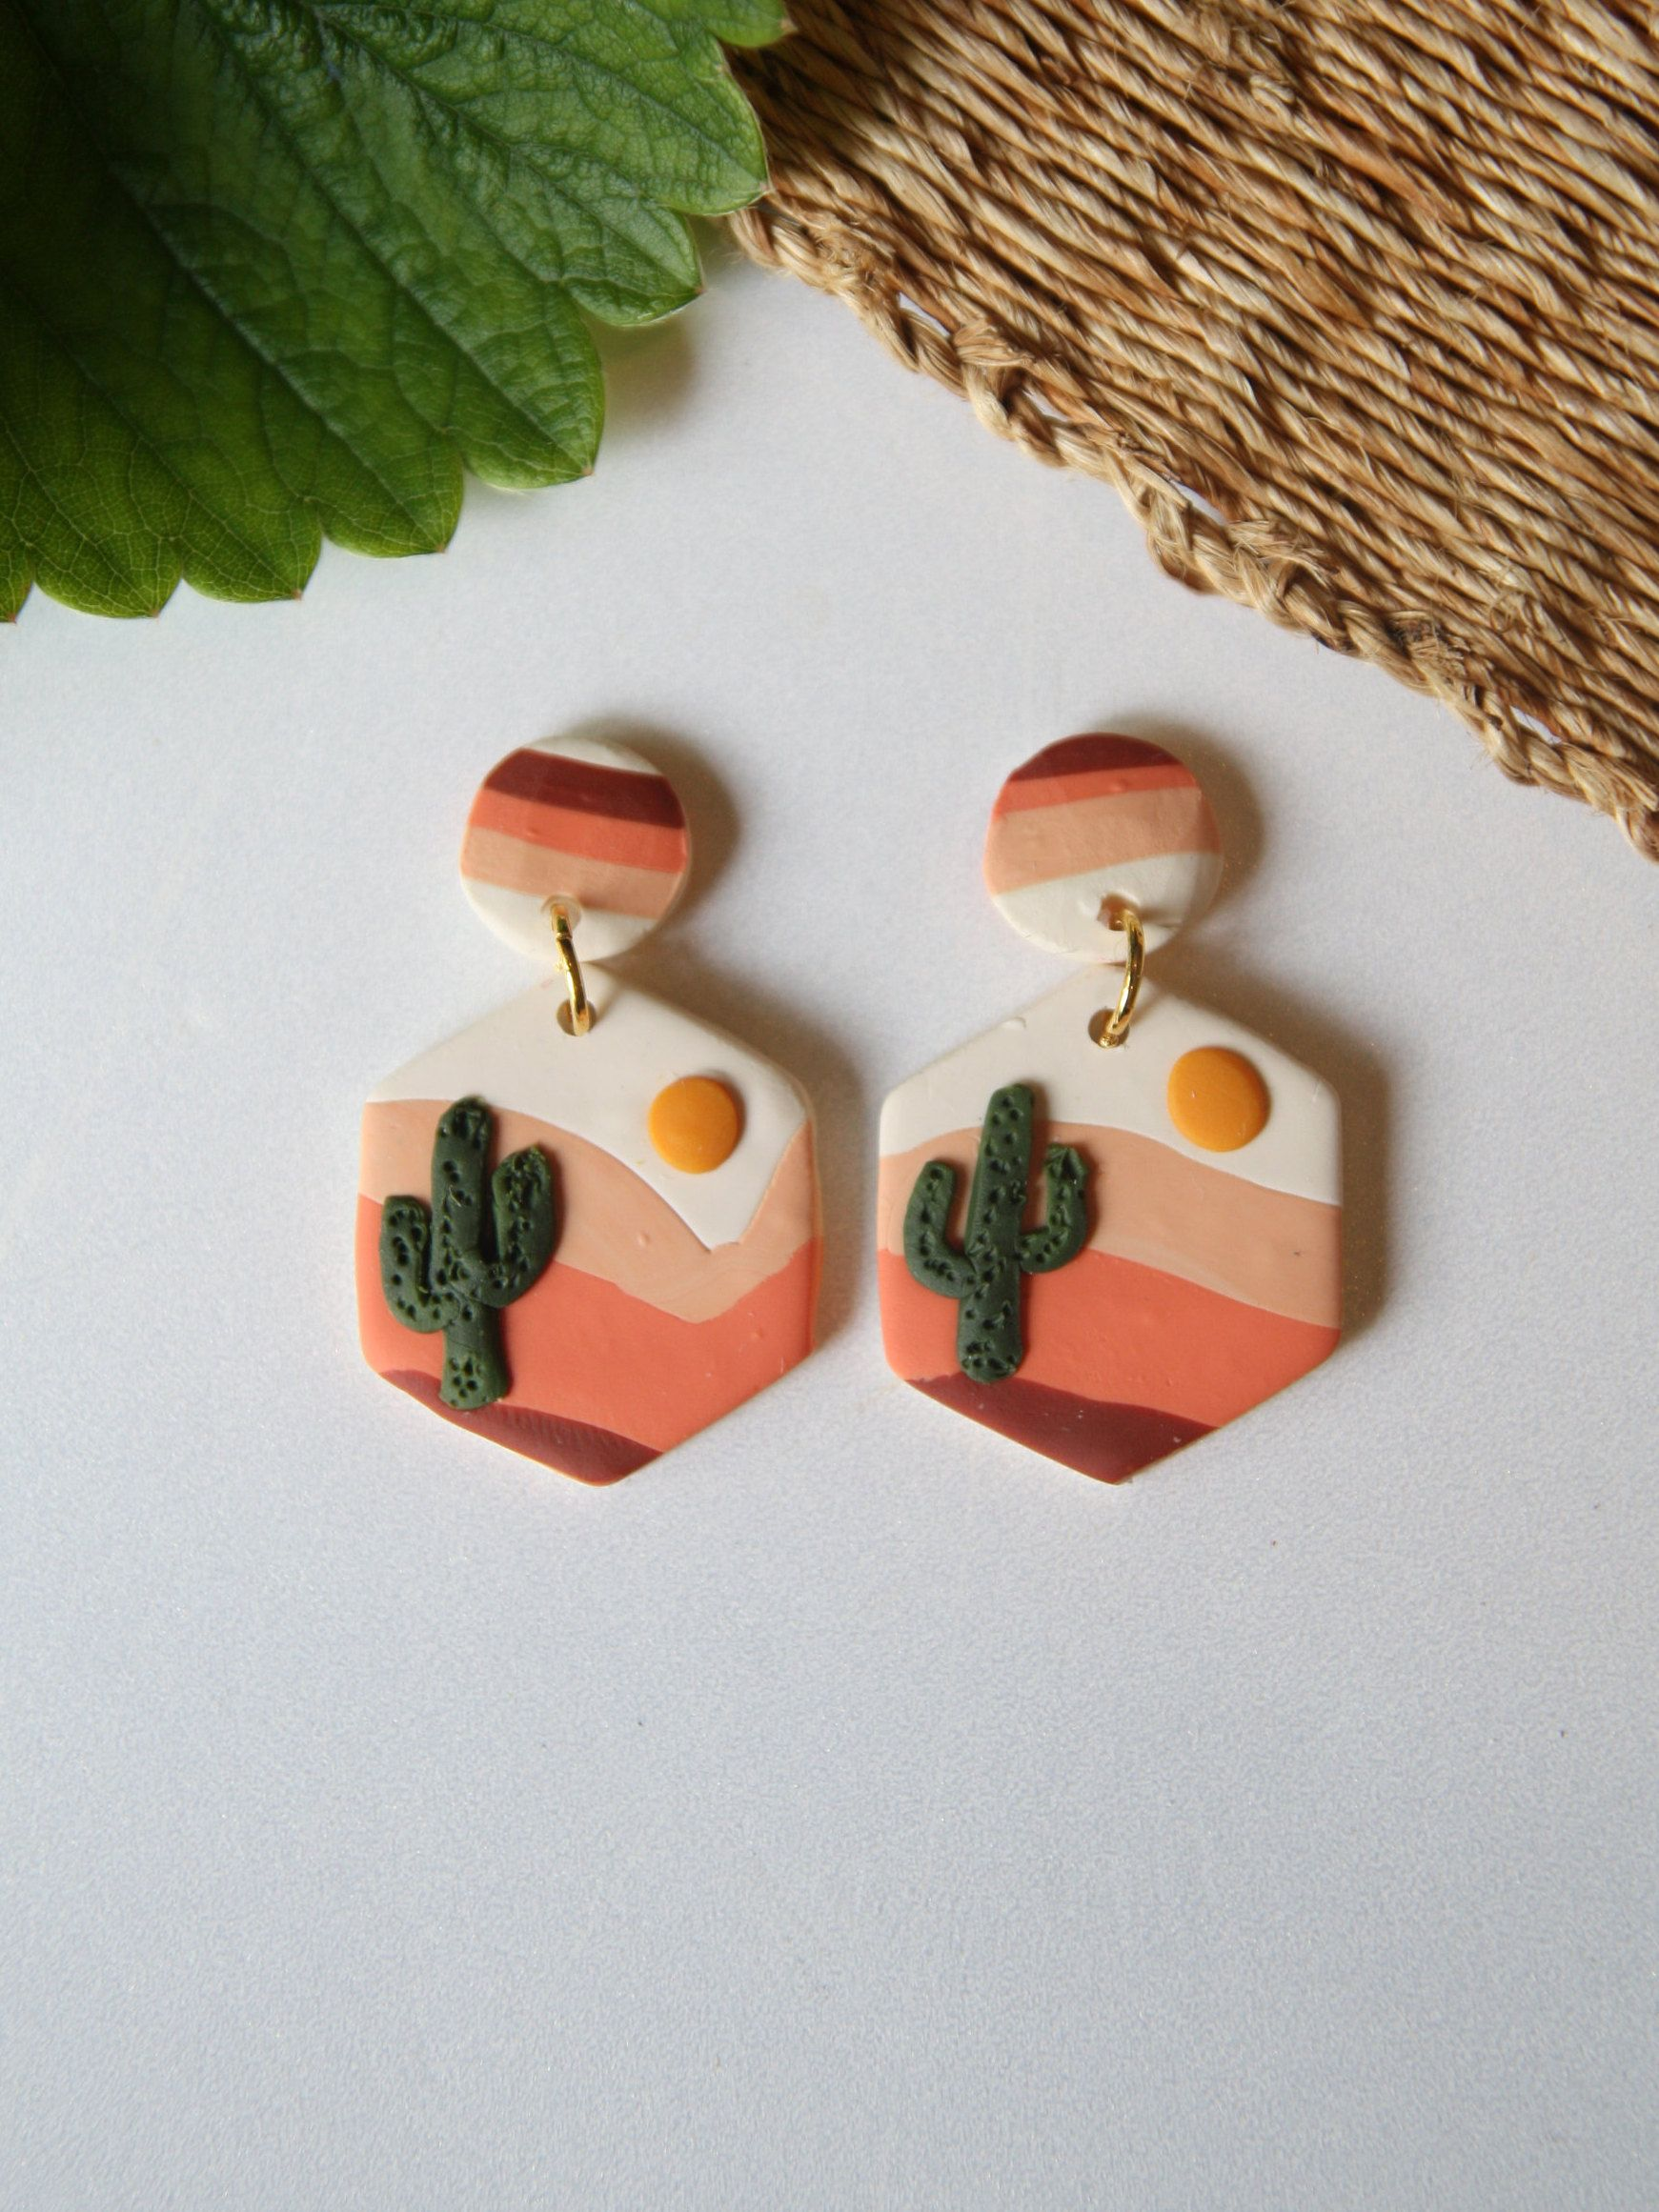 Best Friend Gift Arizona State Hexagon Earrings State Jewelry Stud Earrings Hometown Love Moving Gift Geometric Earrings